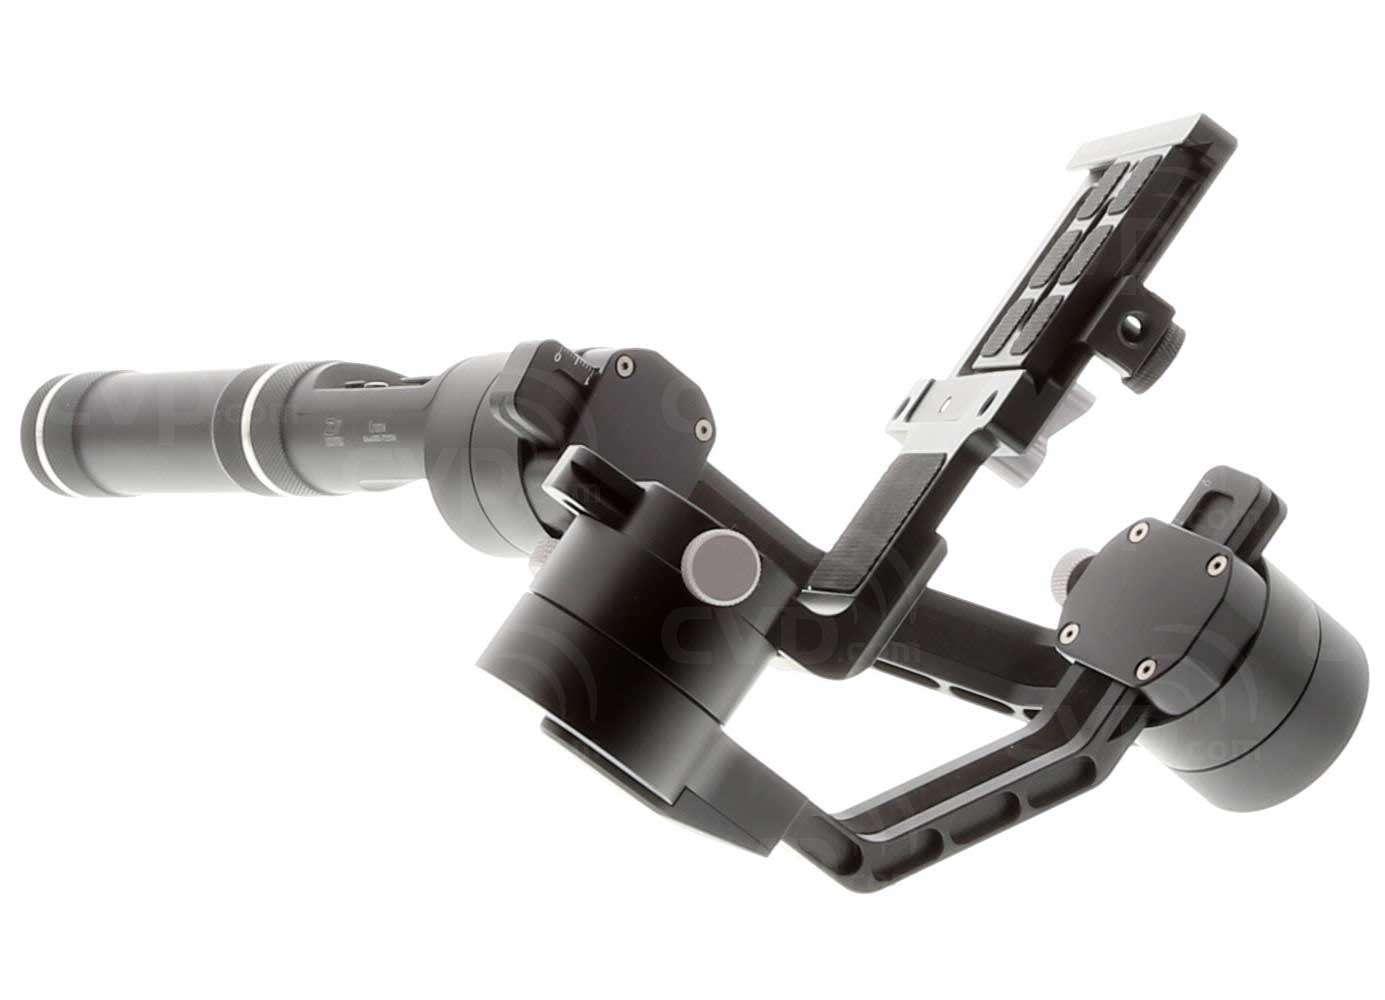 Ex-Demo Zhiyun-Tech Crane V2 Gimbal